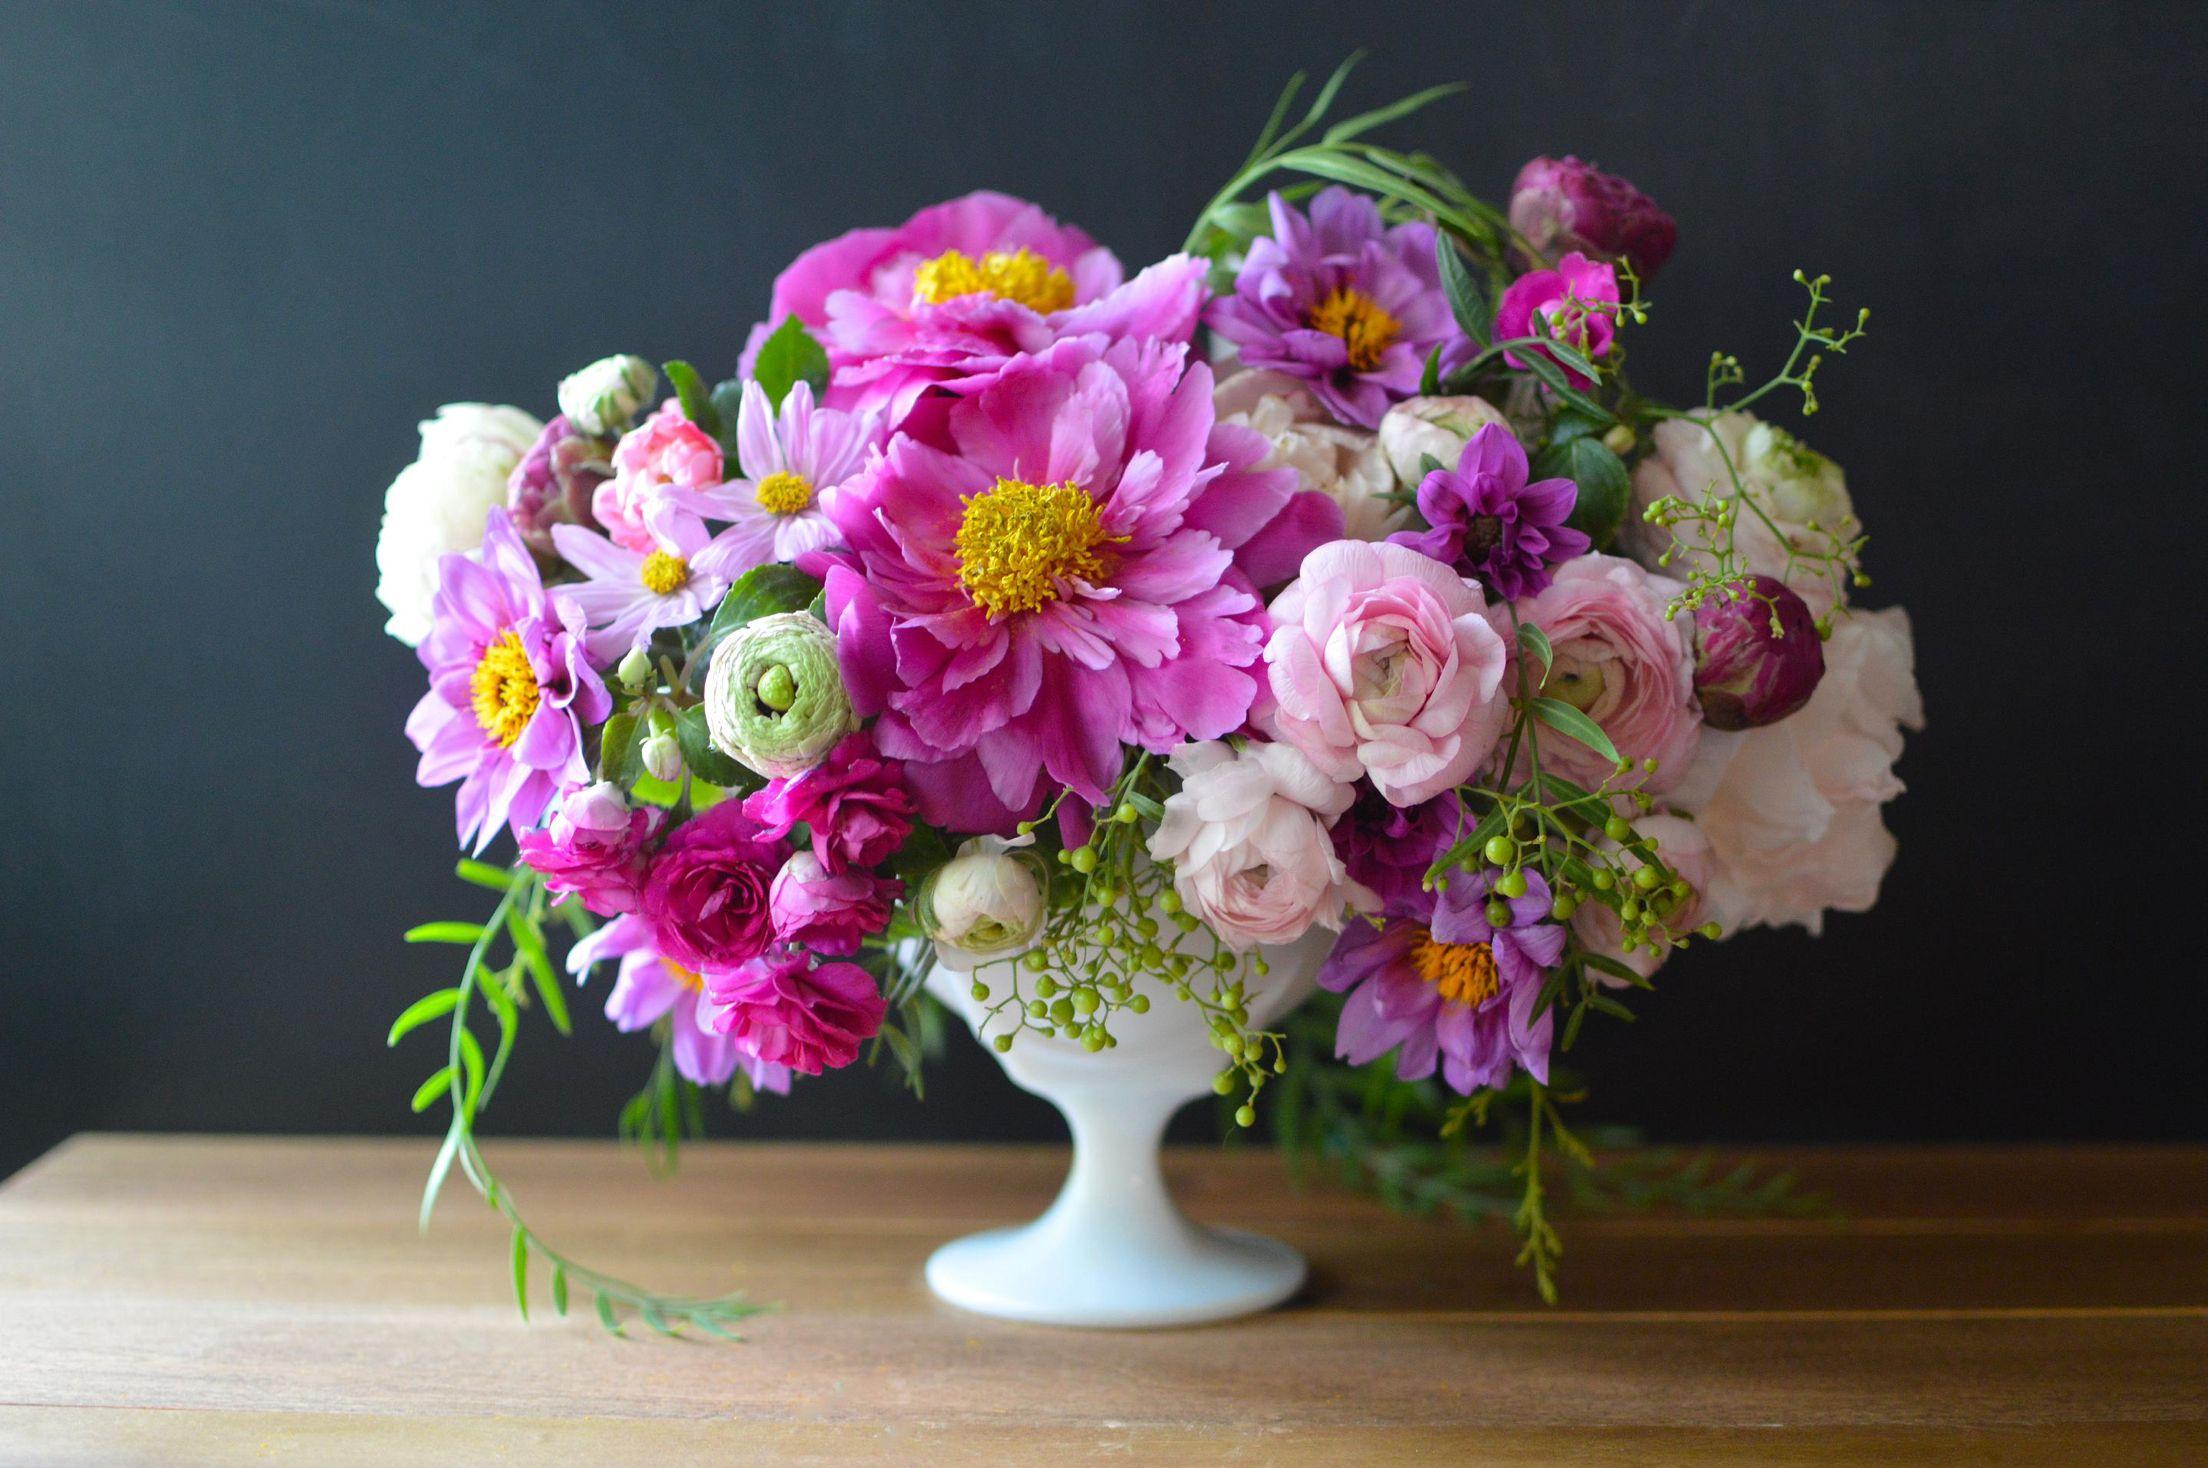 Peonies Dahlias Ranunculus And Cosmos Flower Arrangements Beautiful Flowers Floral Design